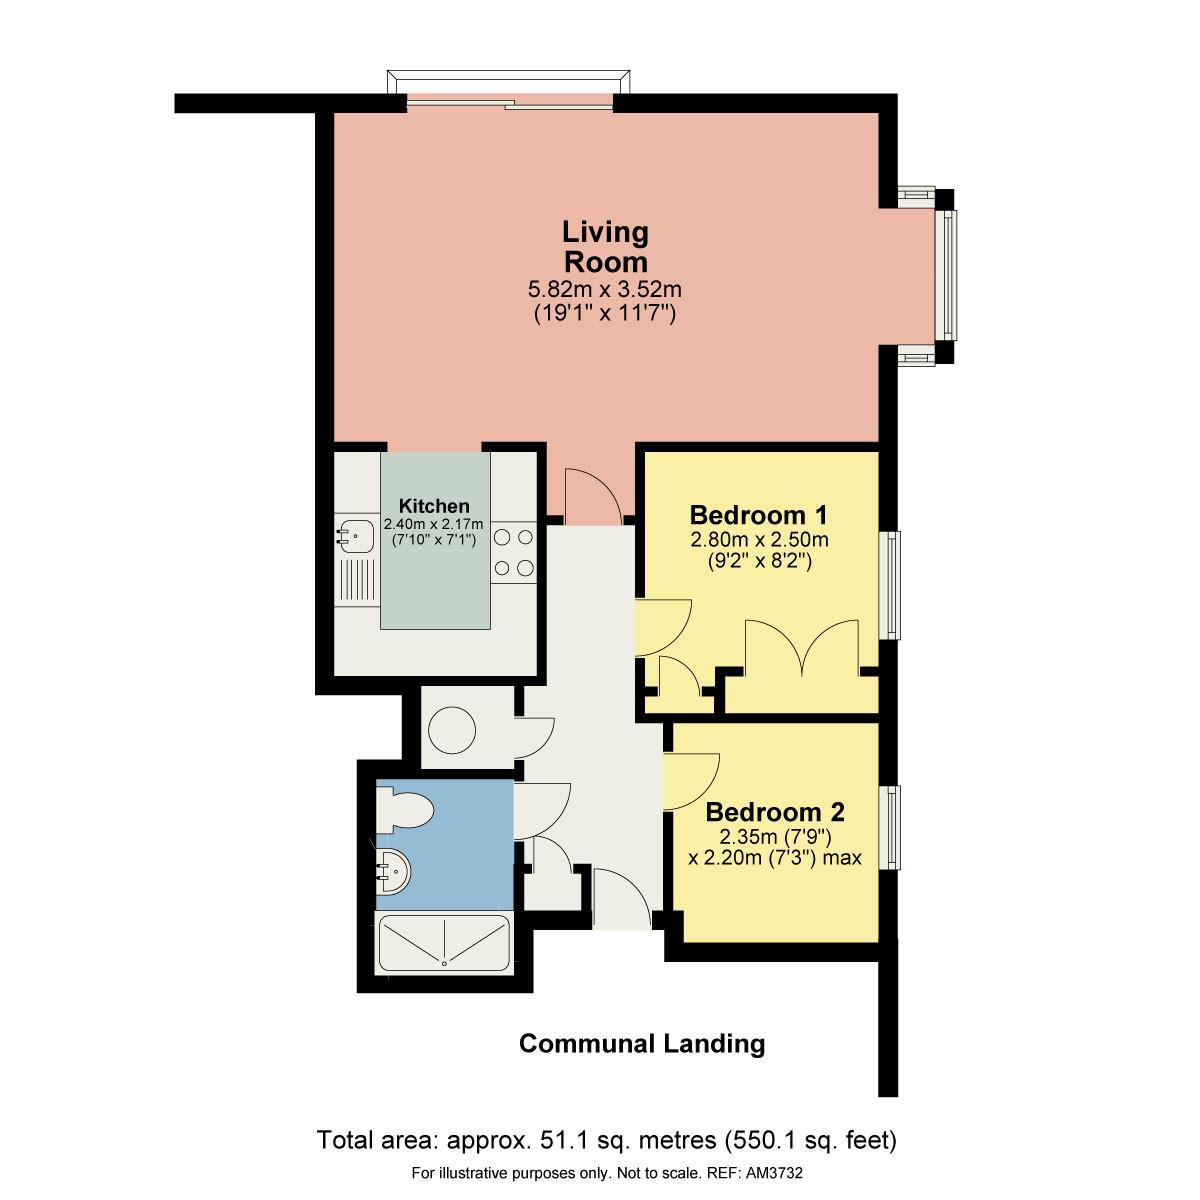 Floorplan 201 Millans Court, Ambleside, Cumbria LA22 9BW